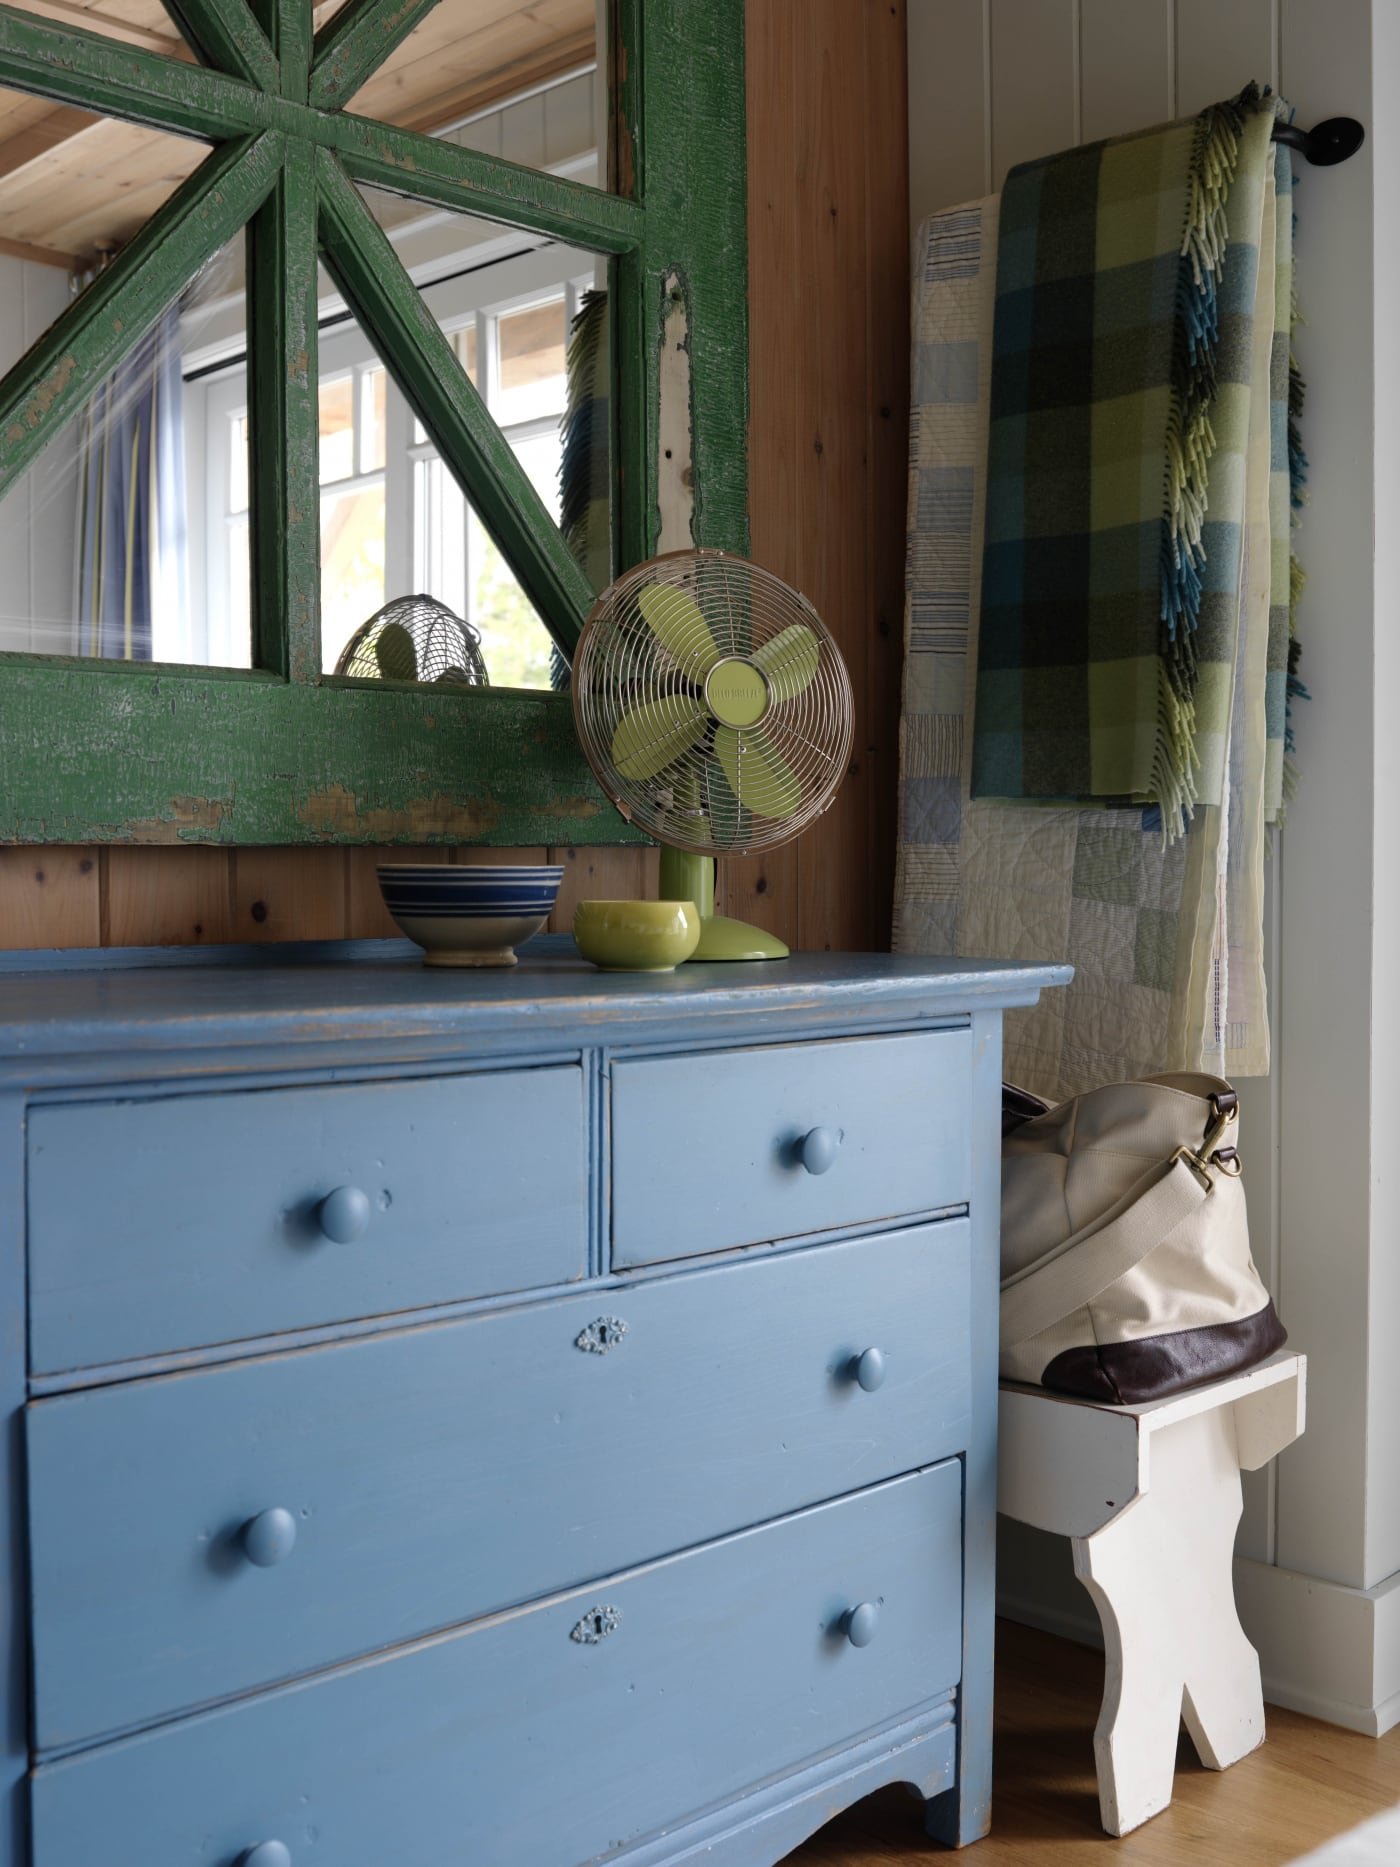 Bright blue dresser with green ornate mirror above. #SarahRichardson #cottagestyle